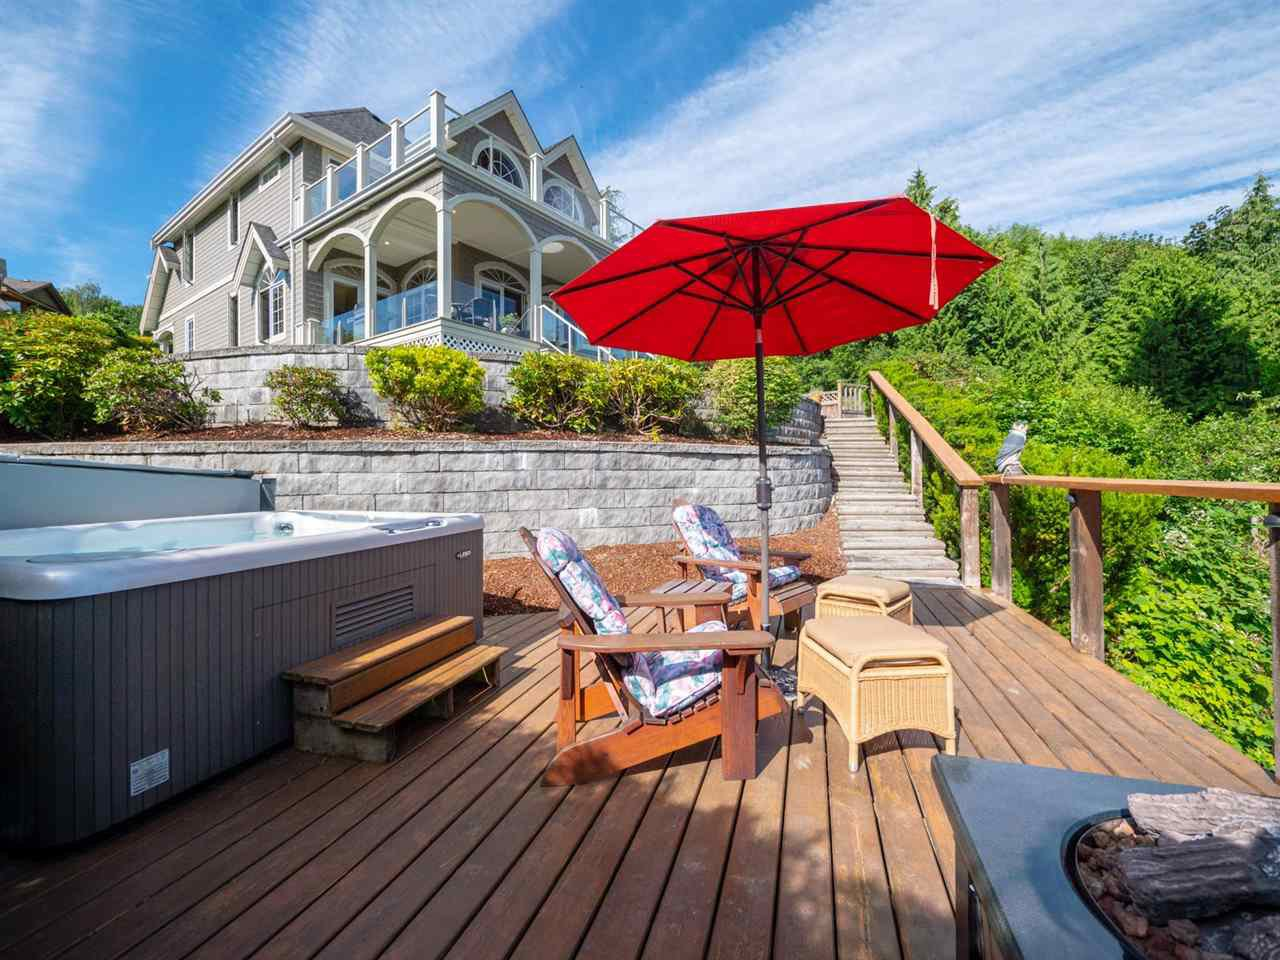 Main Photo: 6560 NORTH GALE Avenue in Sechelt: Sechelt District House for sale (Sunshine Coast)  : MLS®# R2281146